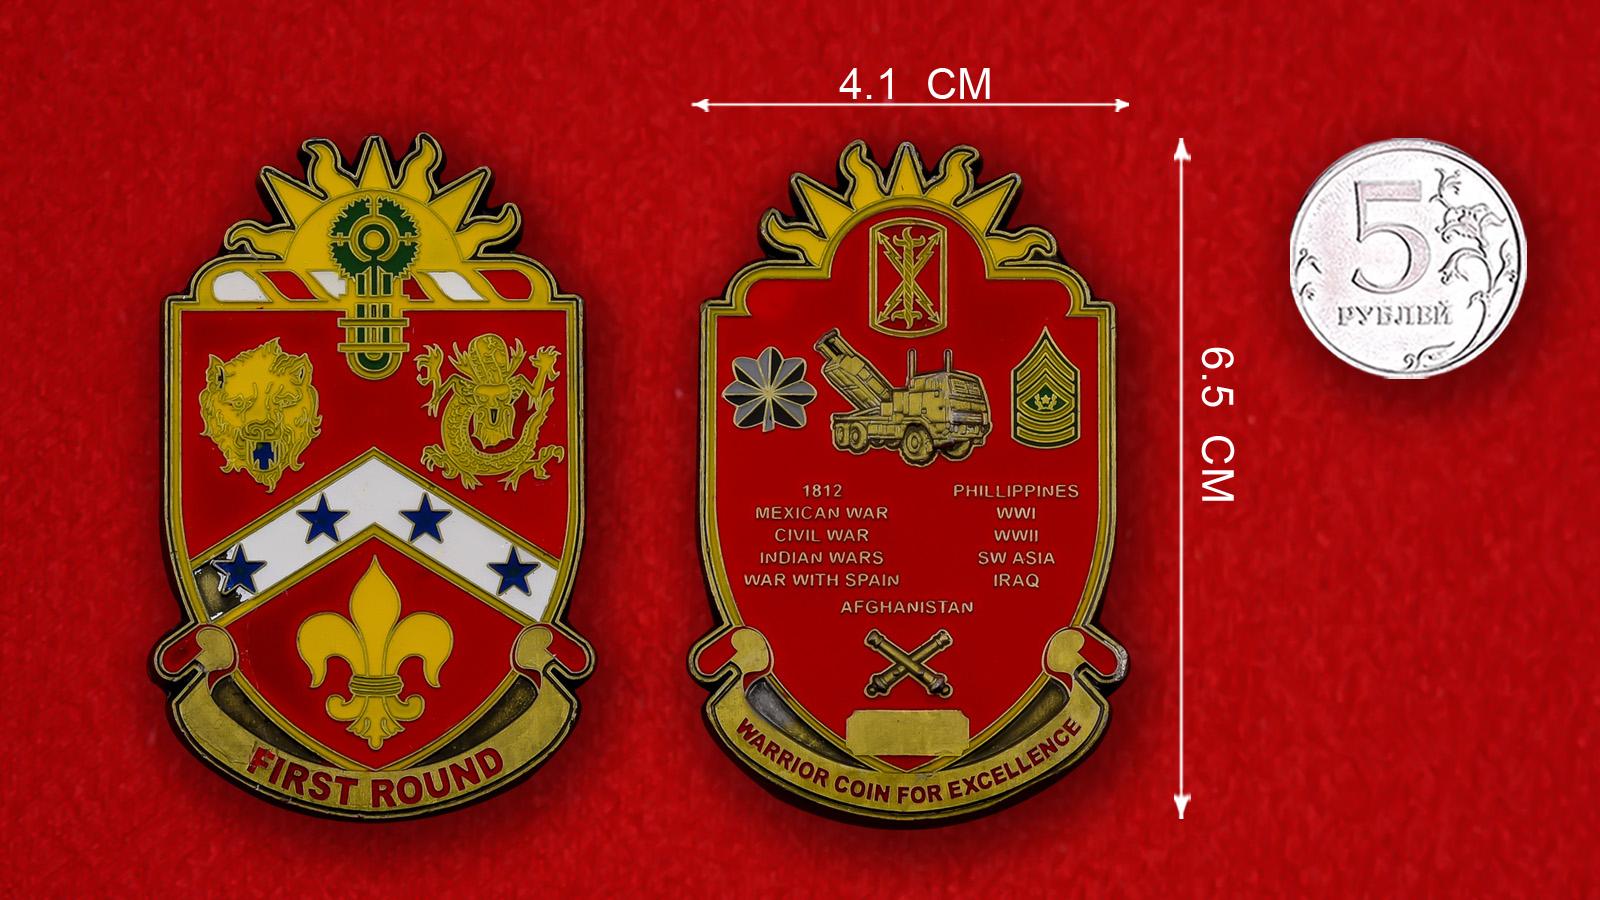 Челлендж коин 5-го батальона 17-й бригады полевой артиллерии